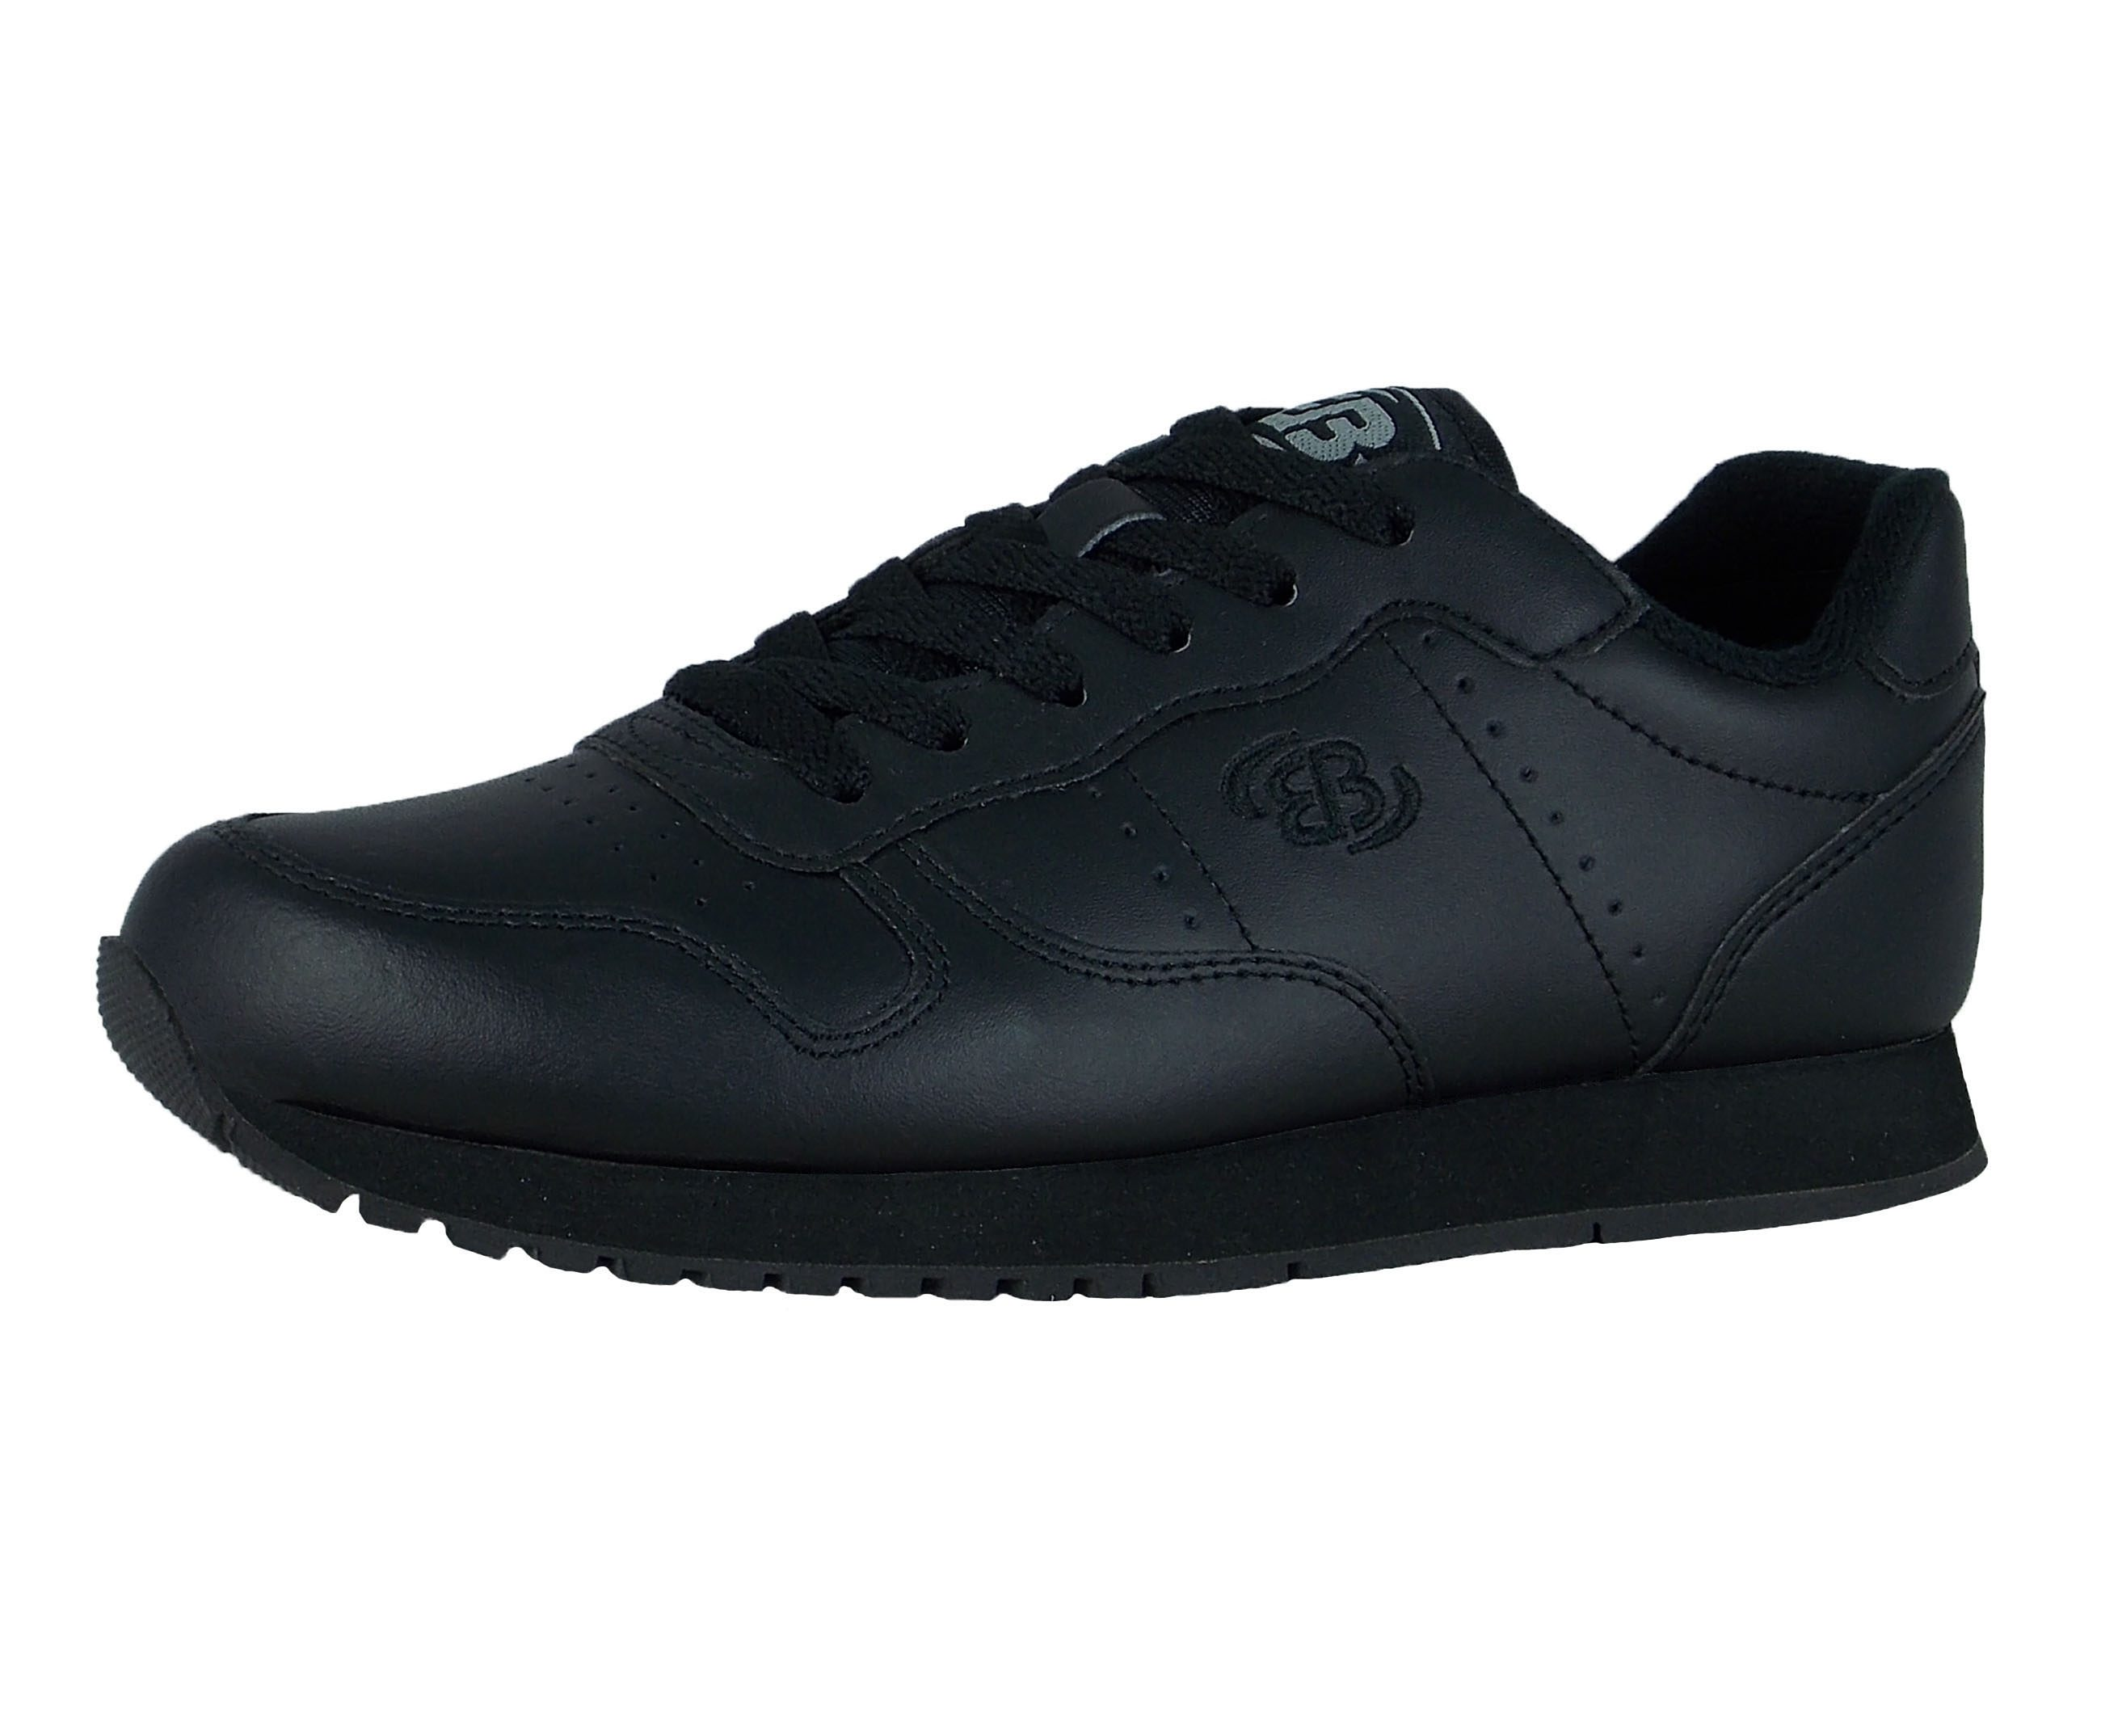 BRÜTTING Sportschuhe Diamond Classic Sneaker  schwarz